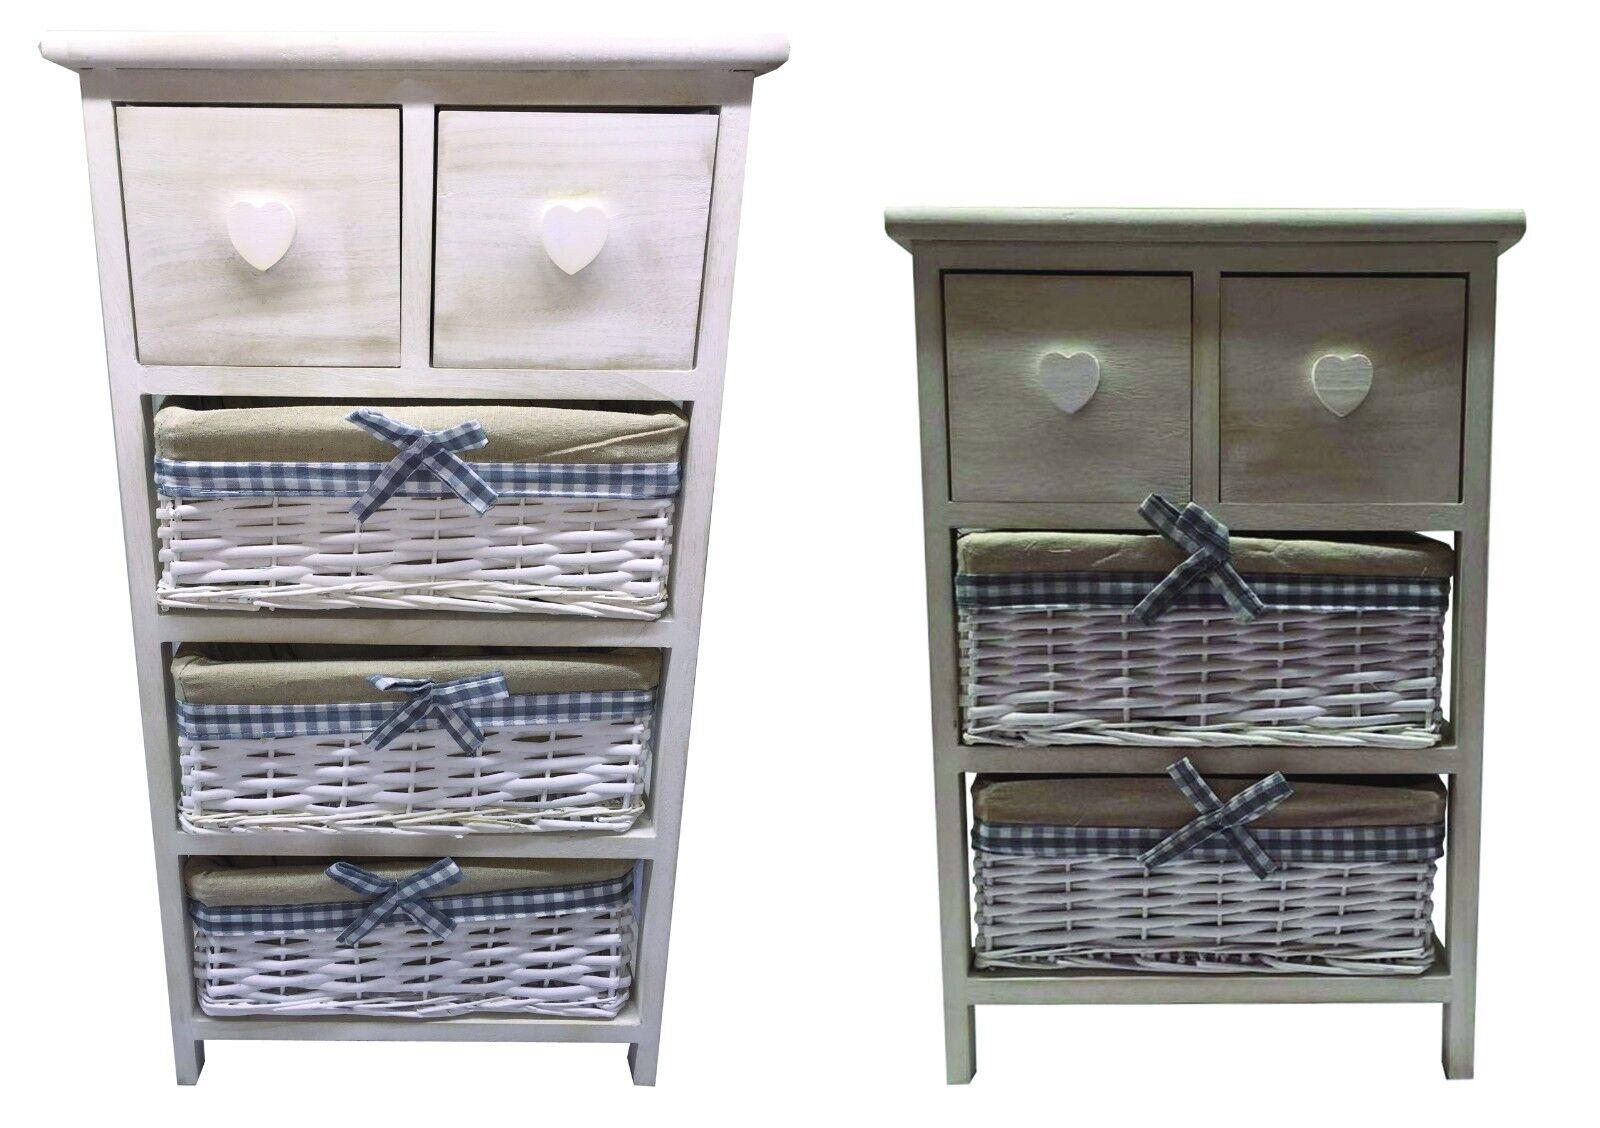 Storage Unit 3 4Tier Drawer Wood Organiser Maize Basket Drawers Bathroom Bedroom